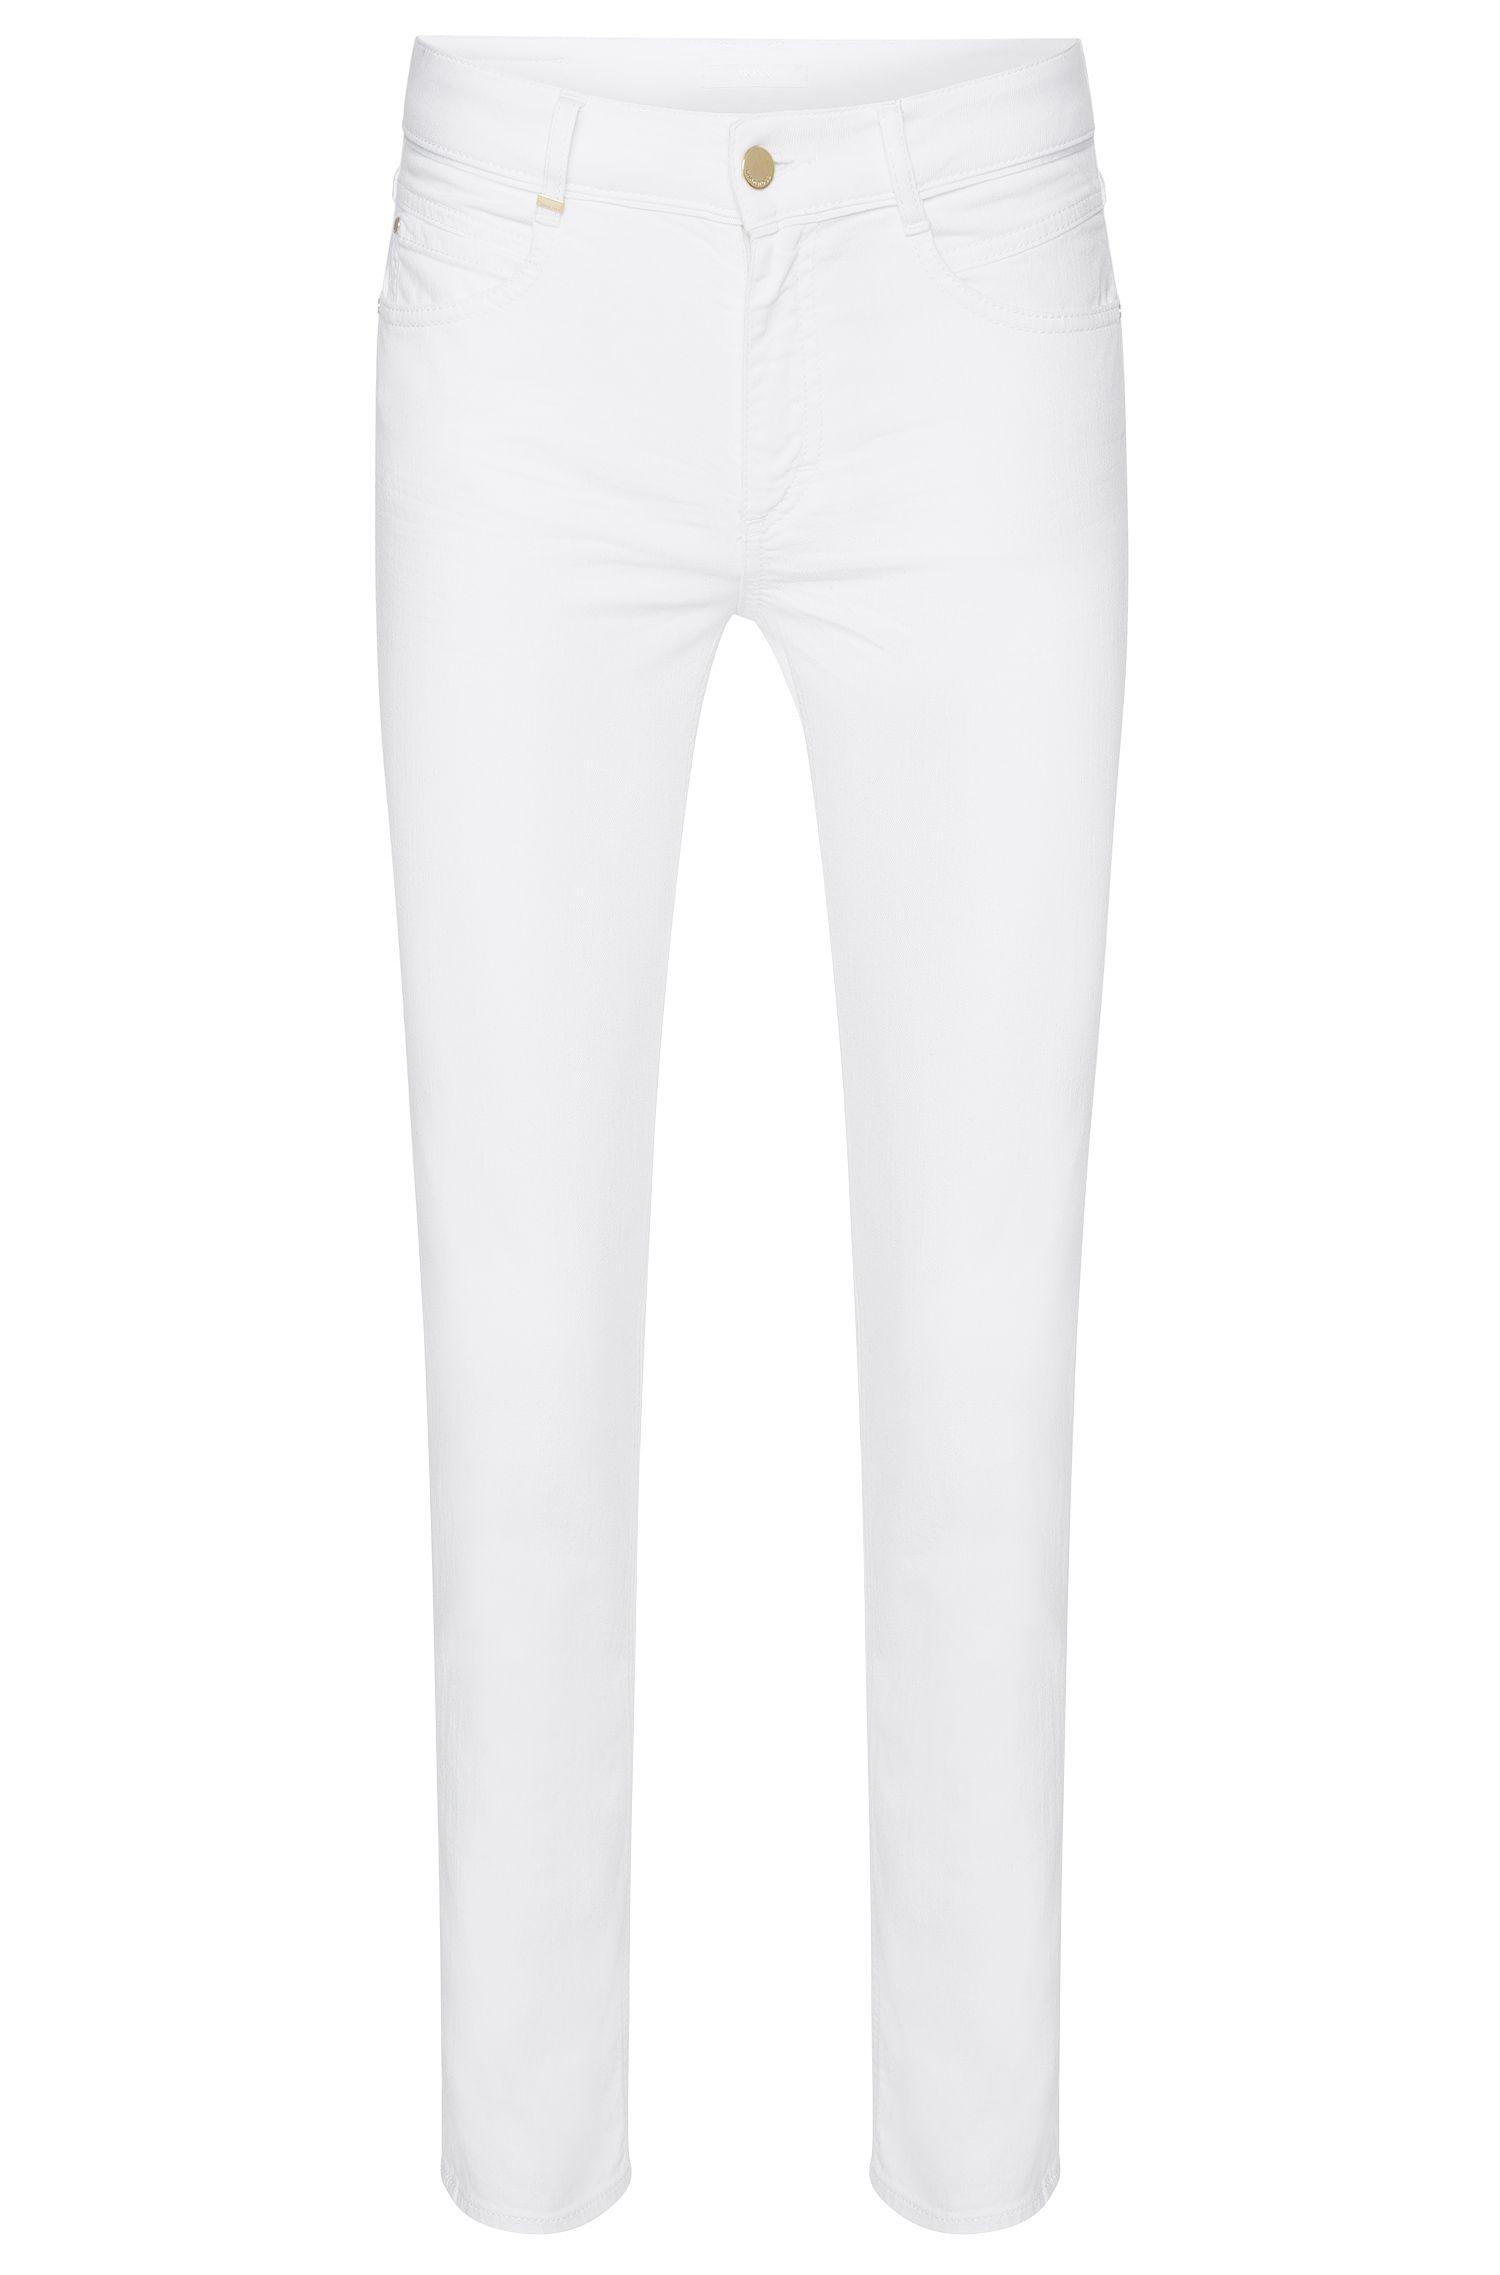 Regular-Fit Jeans aus Stretch-Baumwolle in Cropped-Länge: 'Nelin Tape'